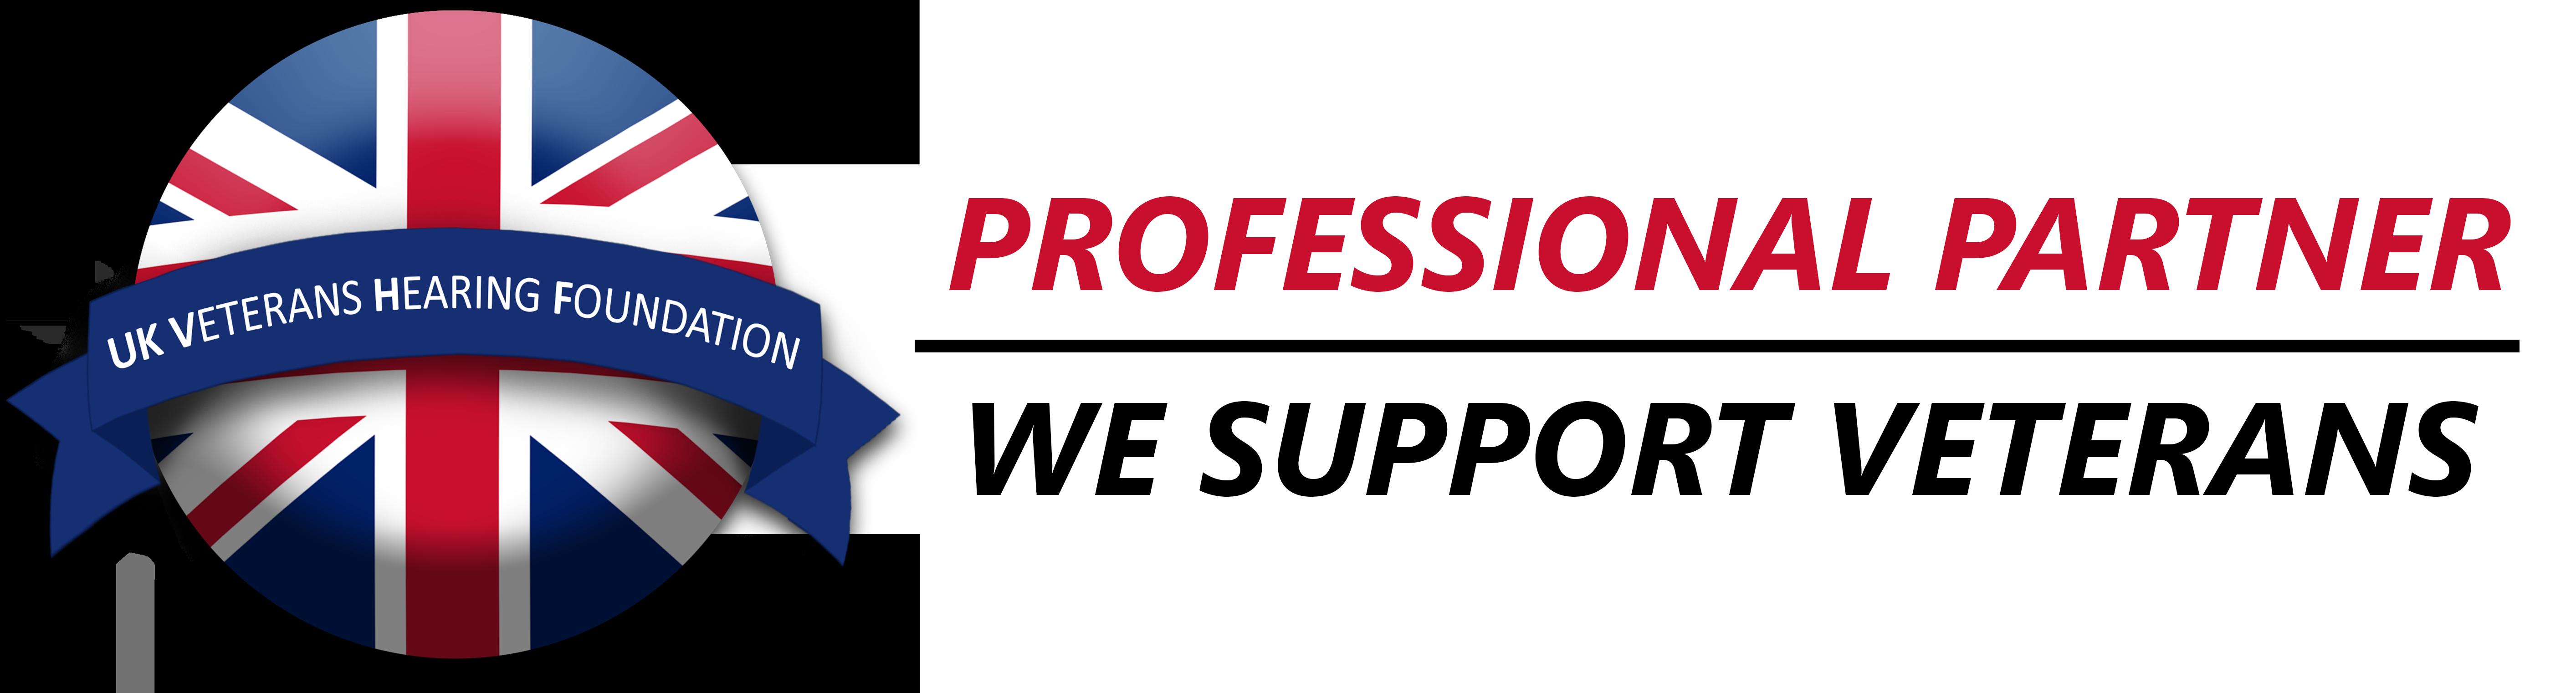 UK Veterans Hearing Foundation - Friends of the foundation logo